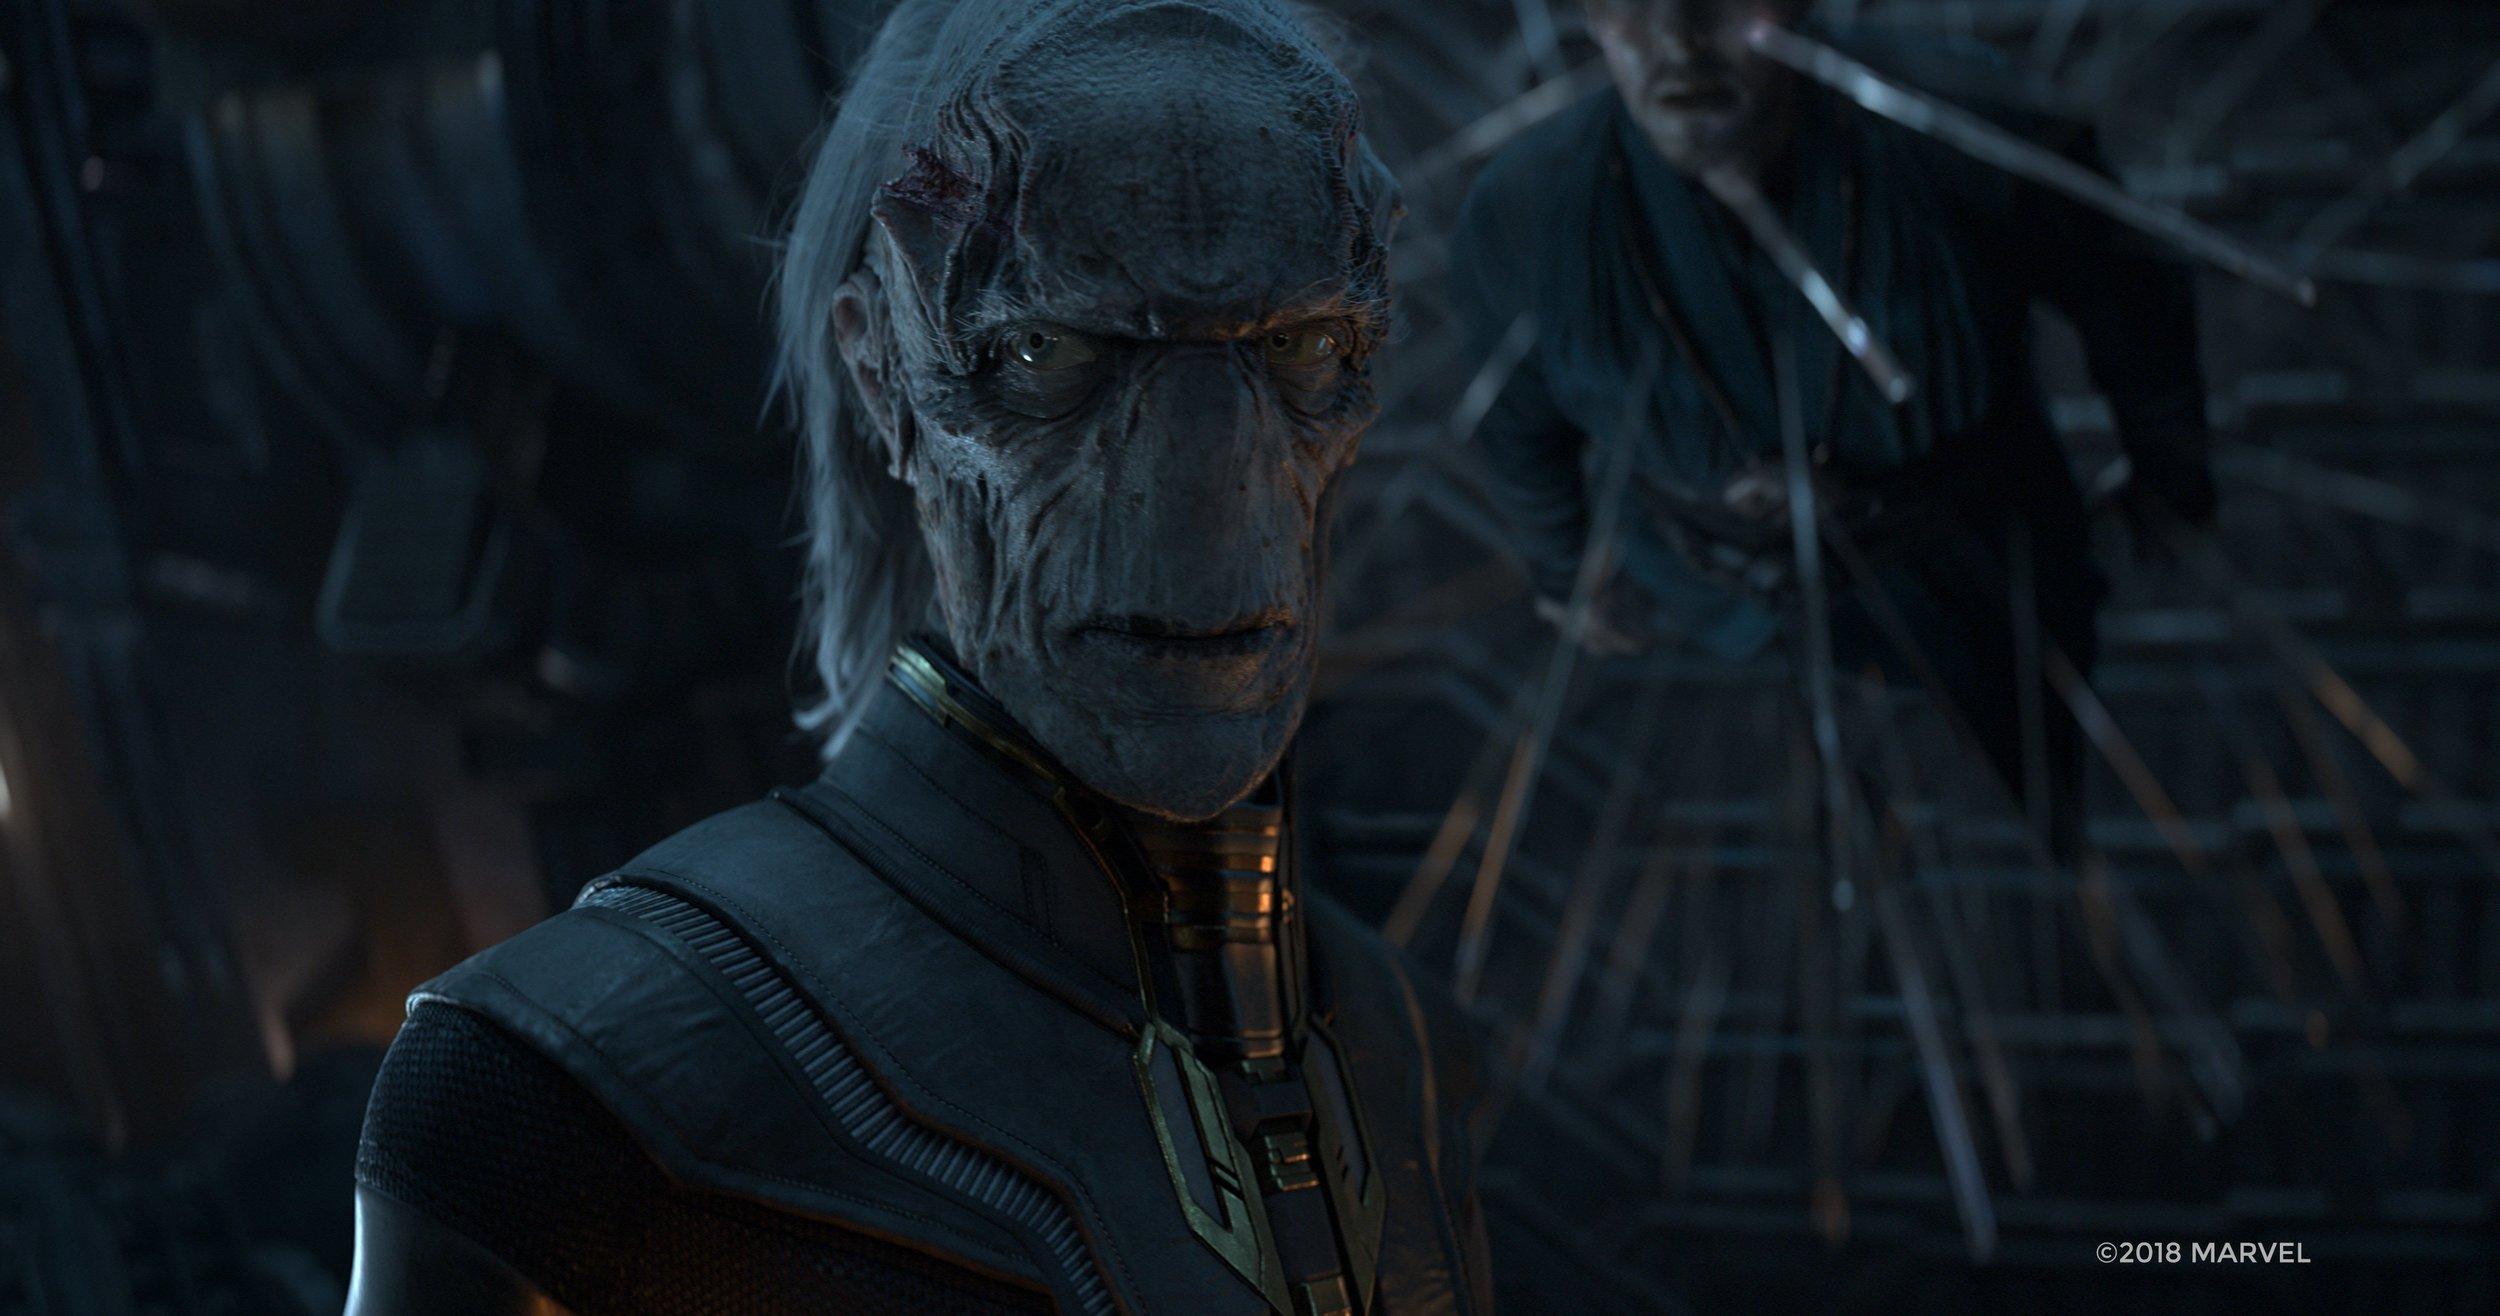 Copy of AVENGERS | Infinity War / Endgame